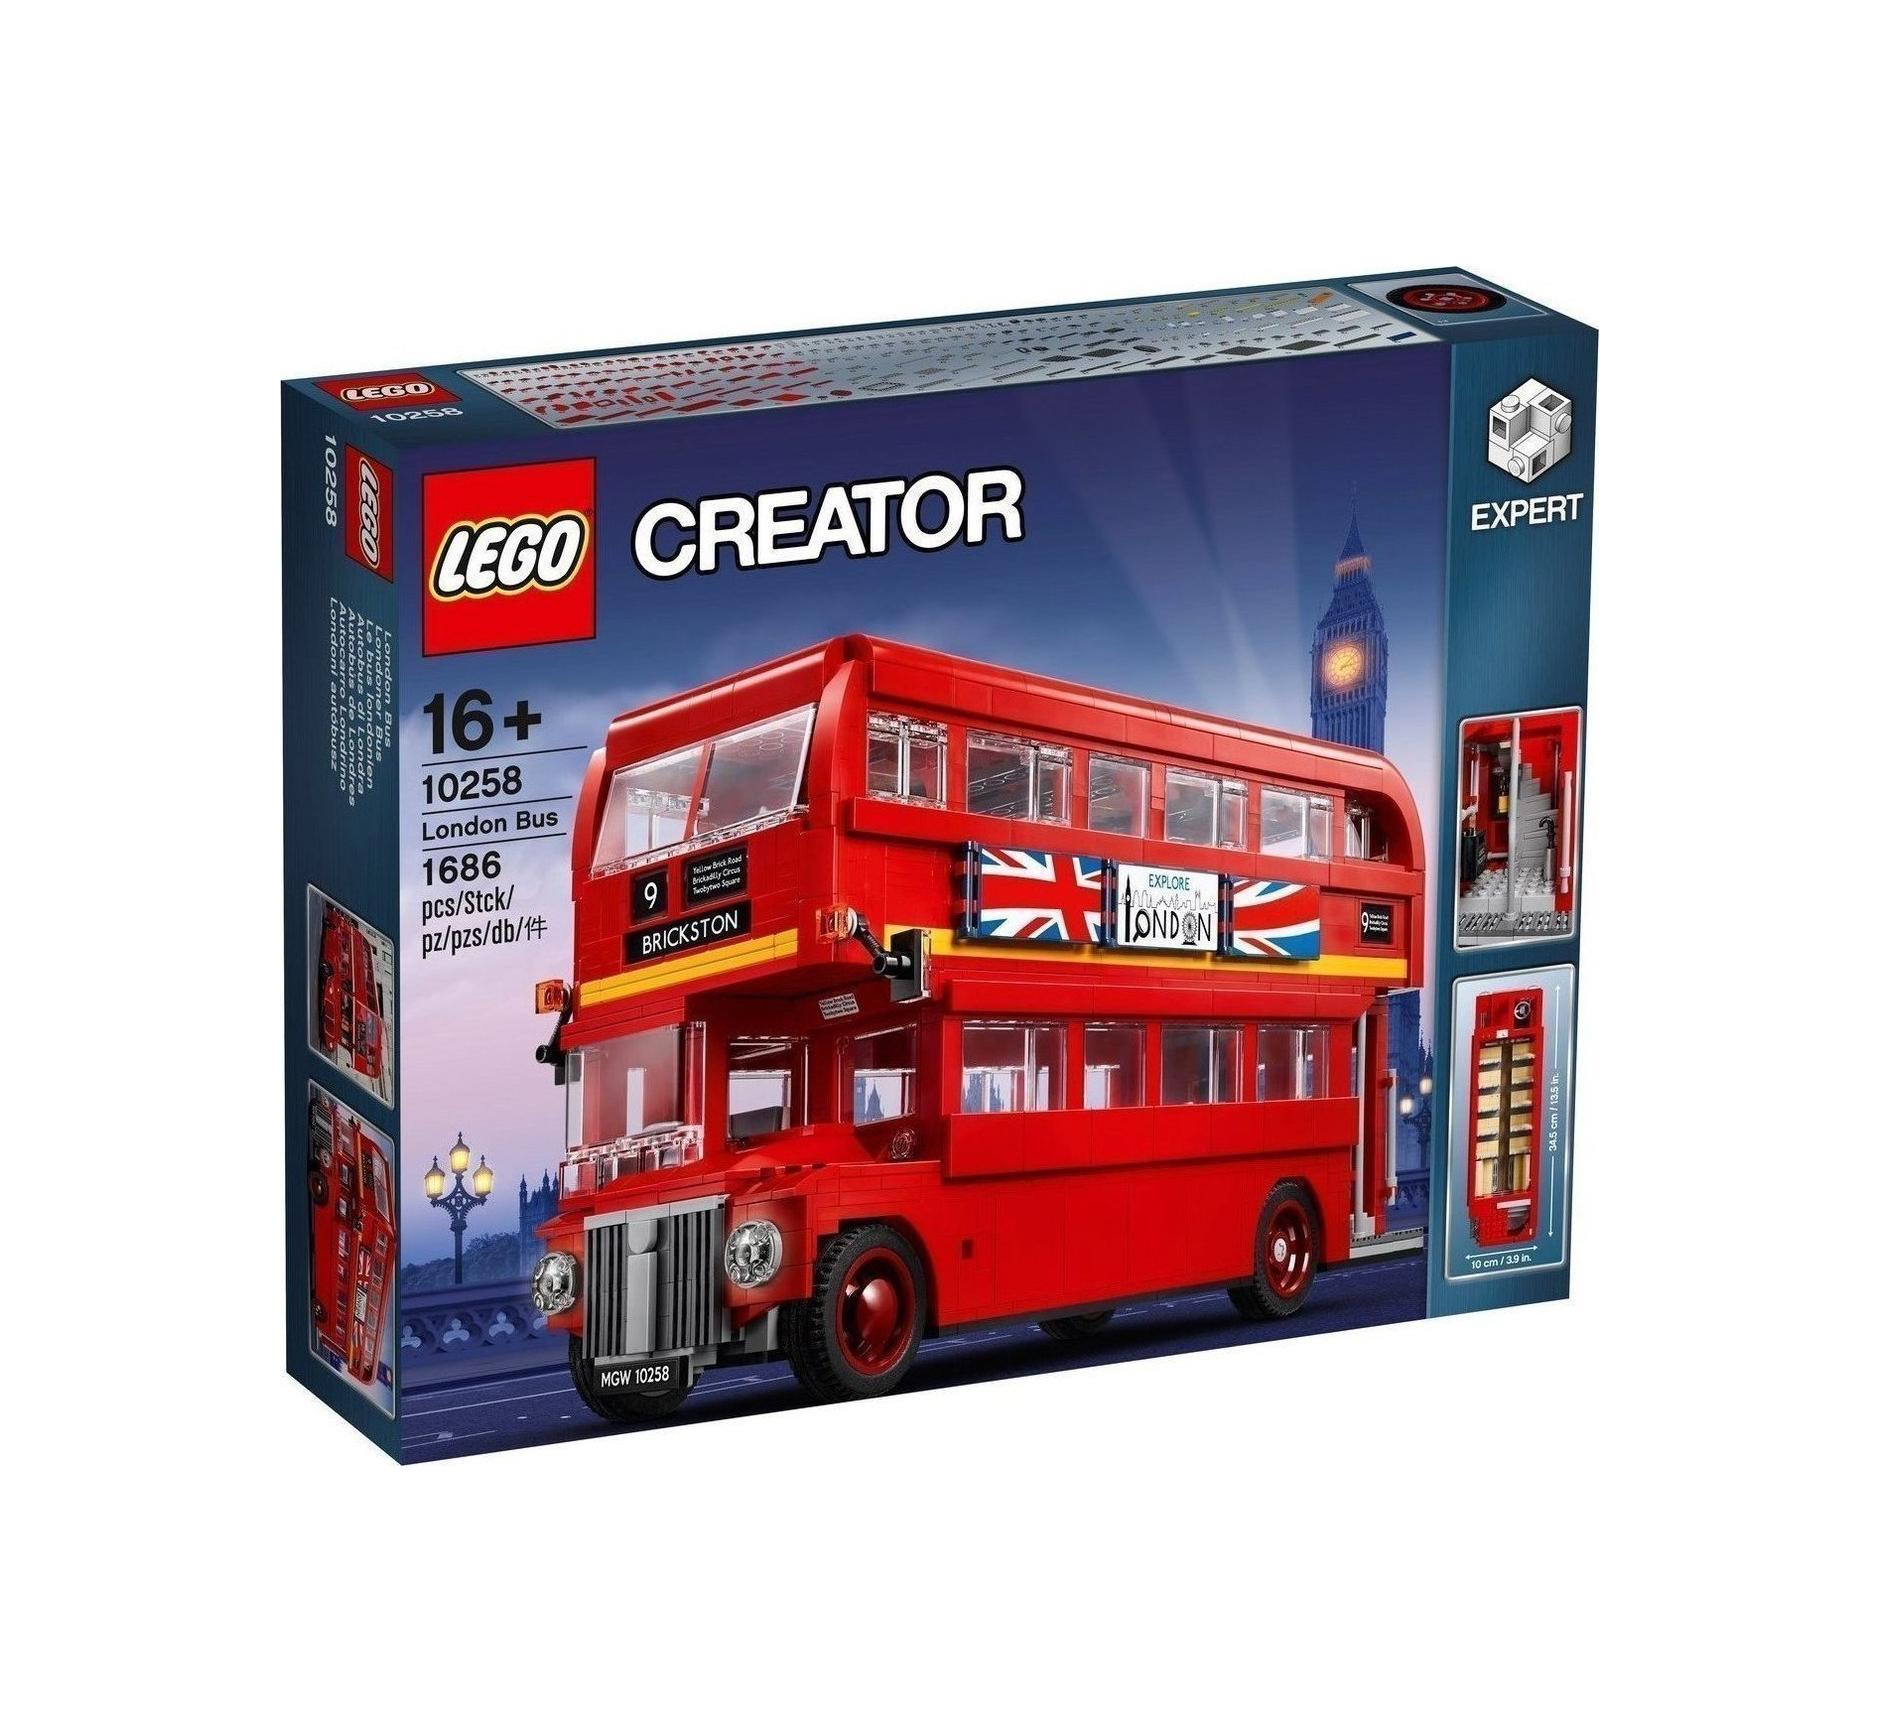 Lego Creator: London Bus 10258